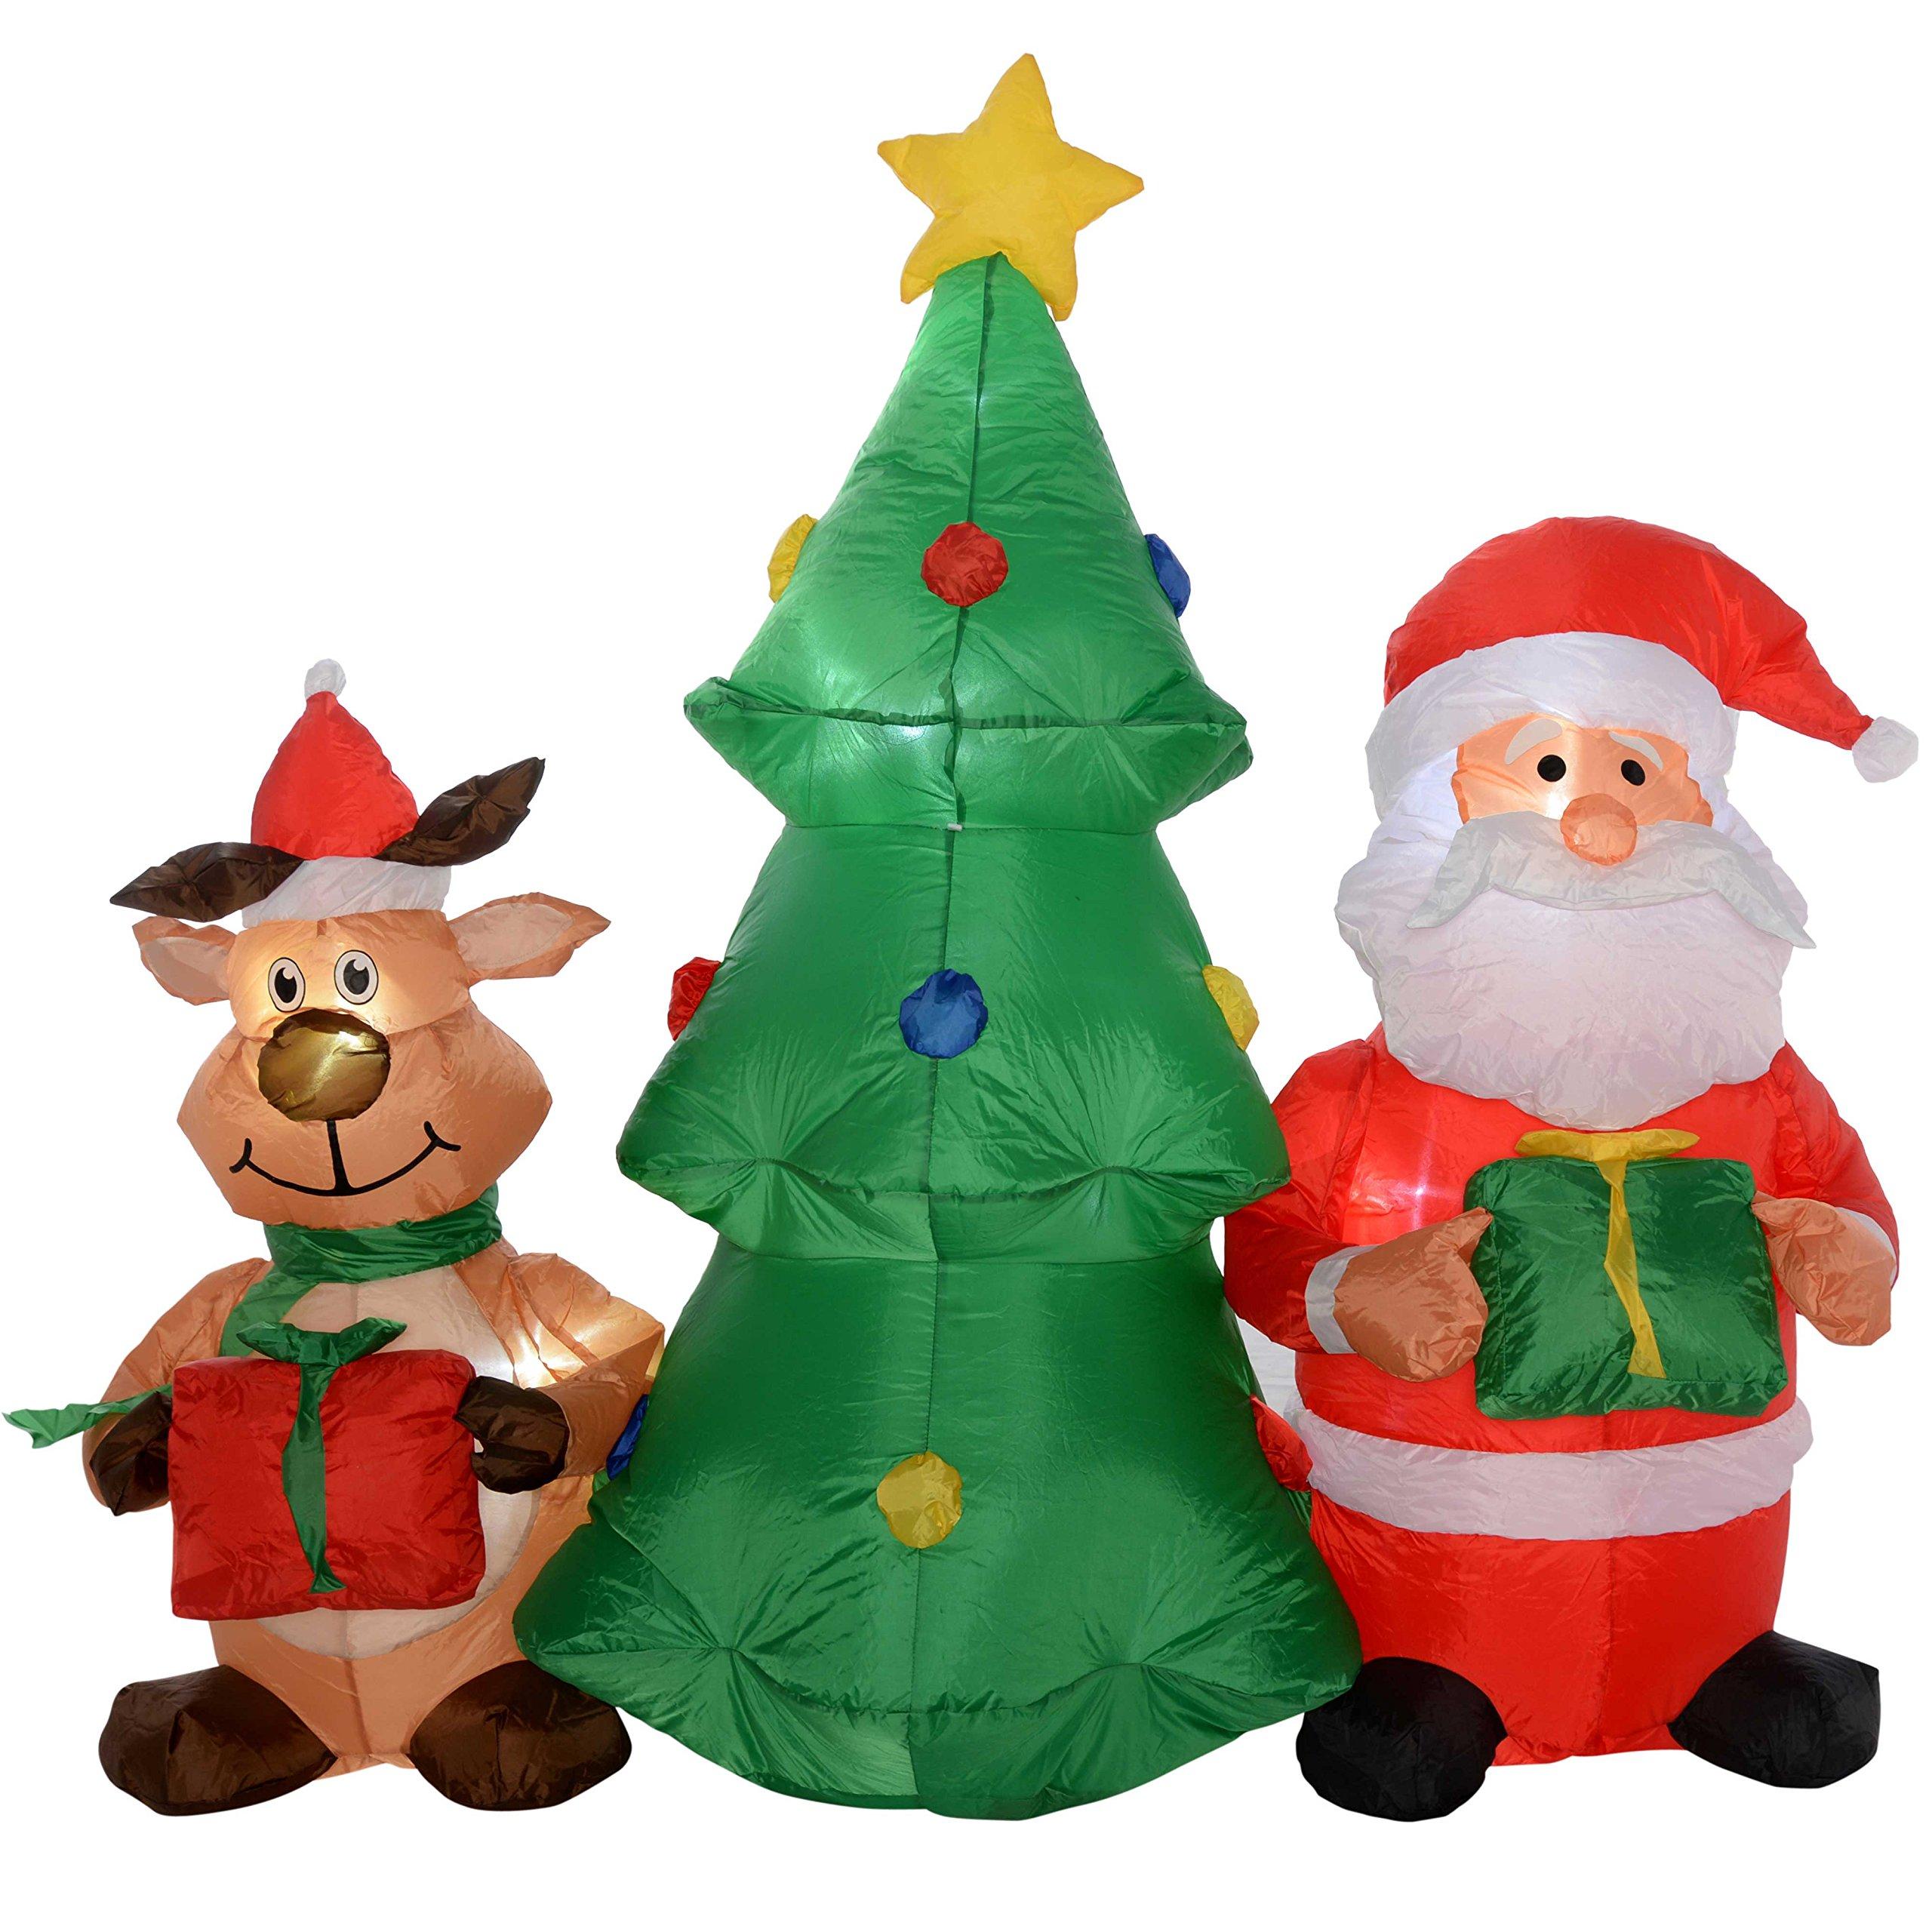 Large Outdoor Christmas Decorations: Amazon.co.uk